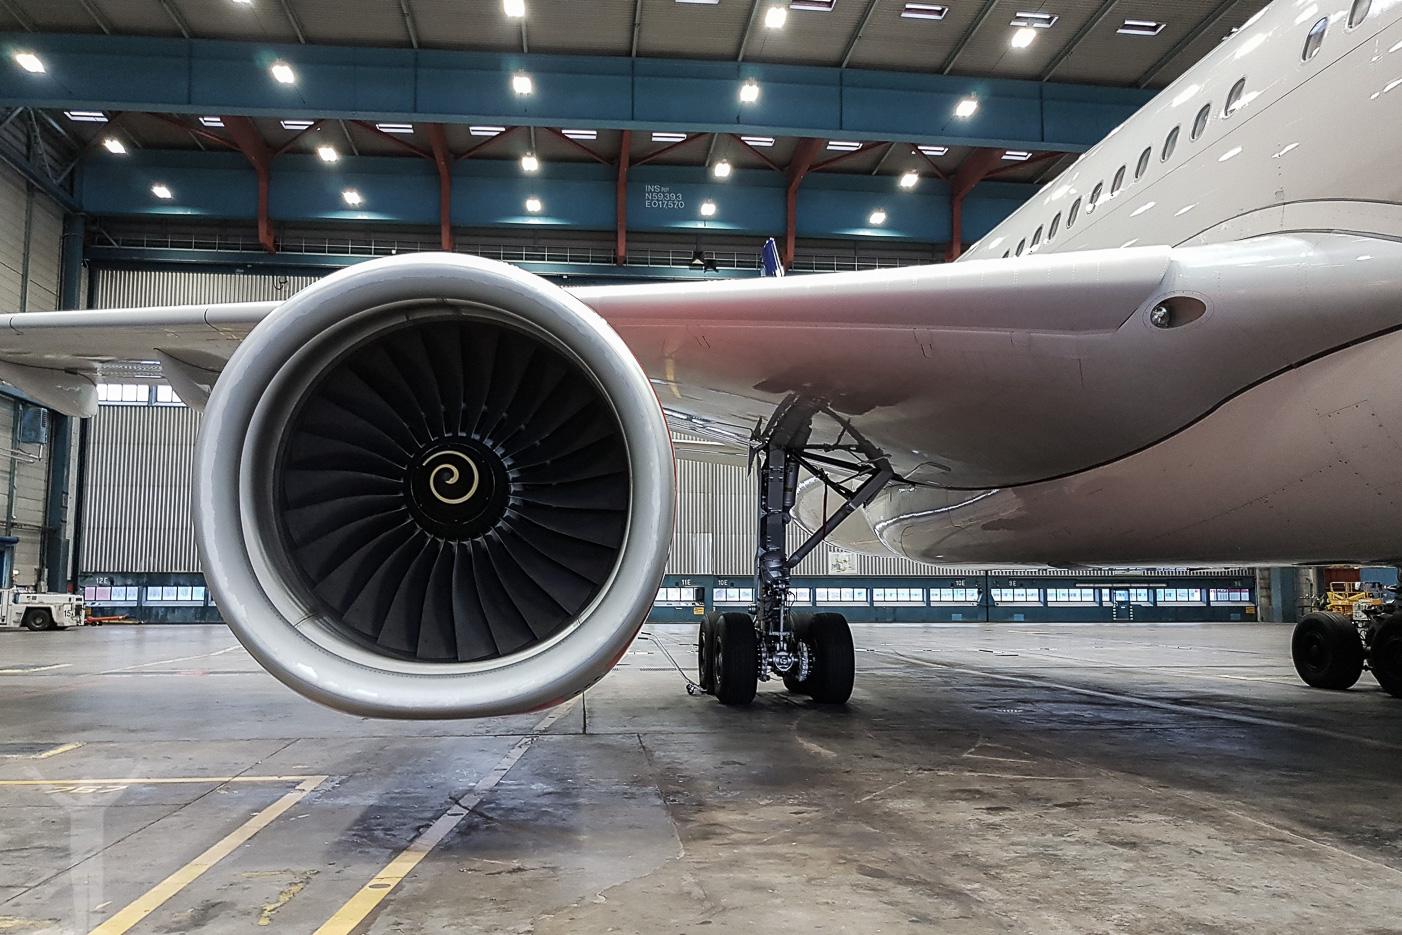 Rolls-Royce Trent 772B-60